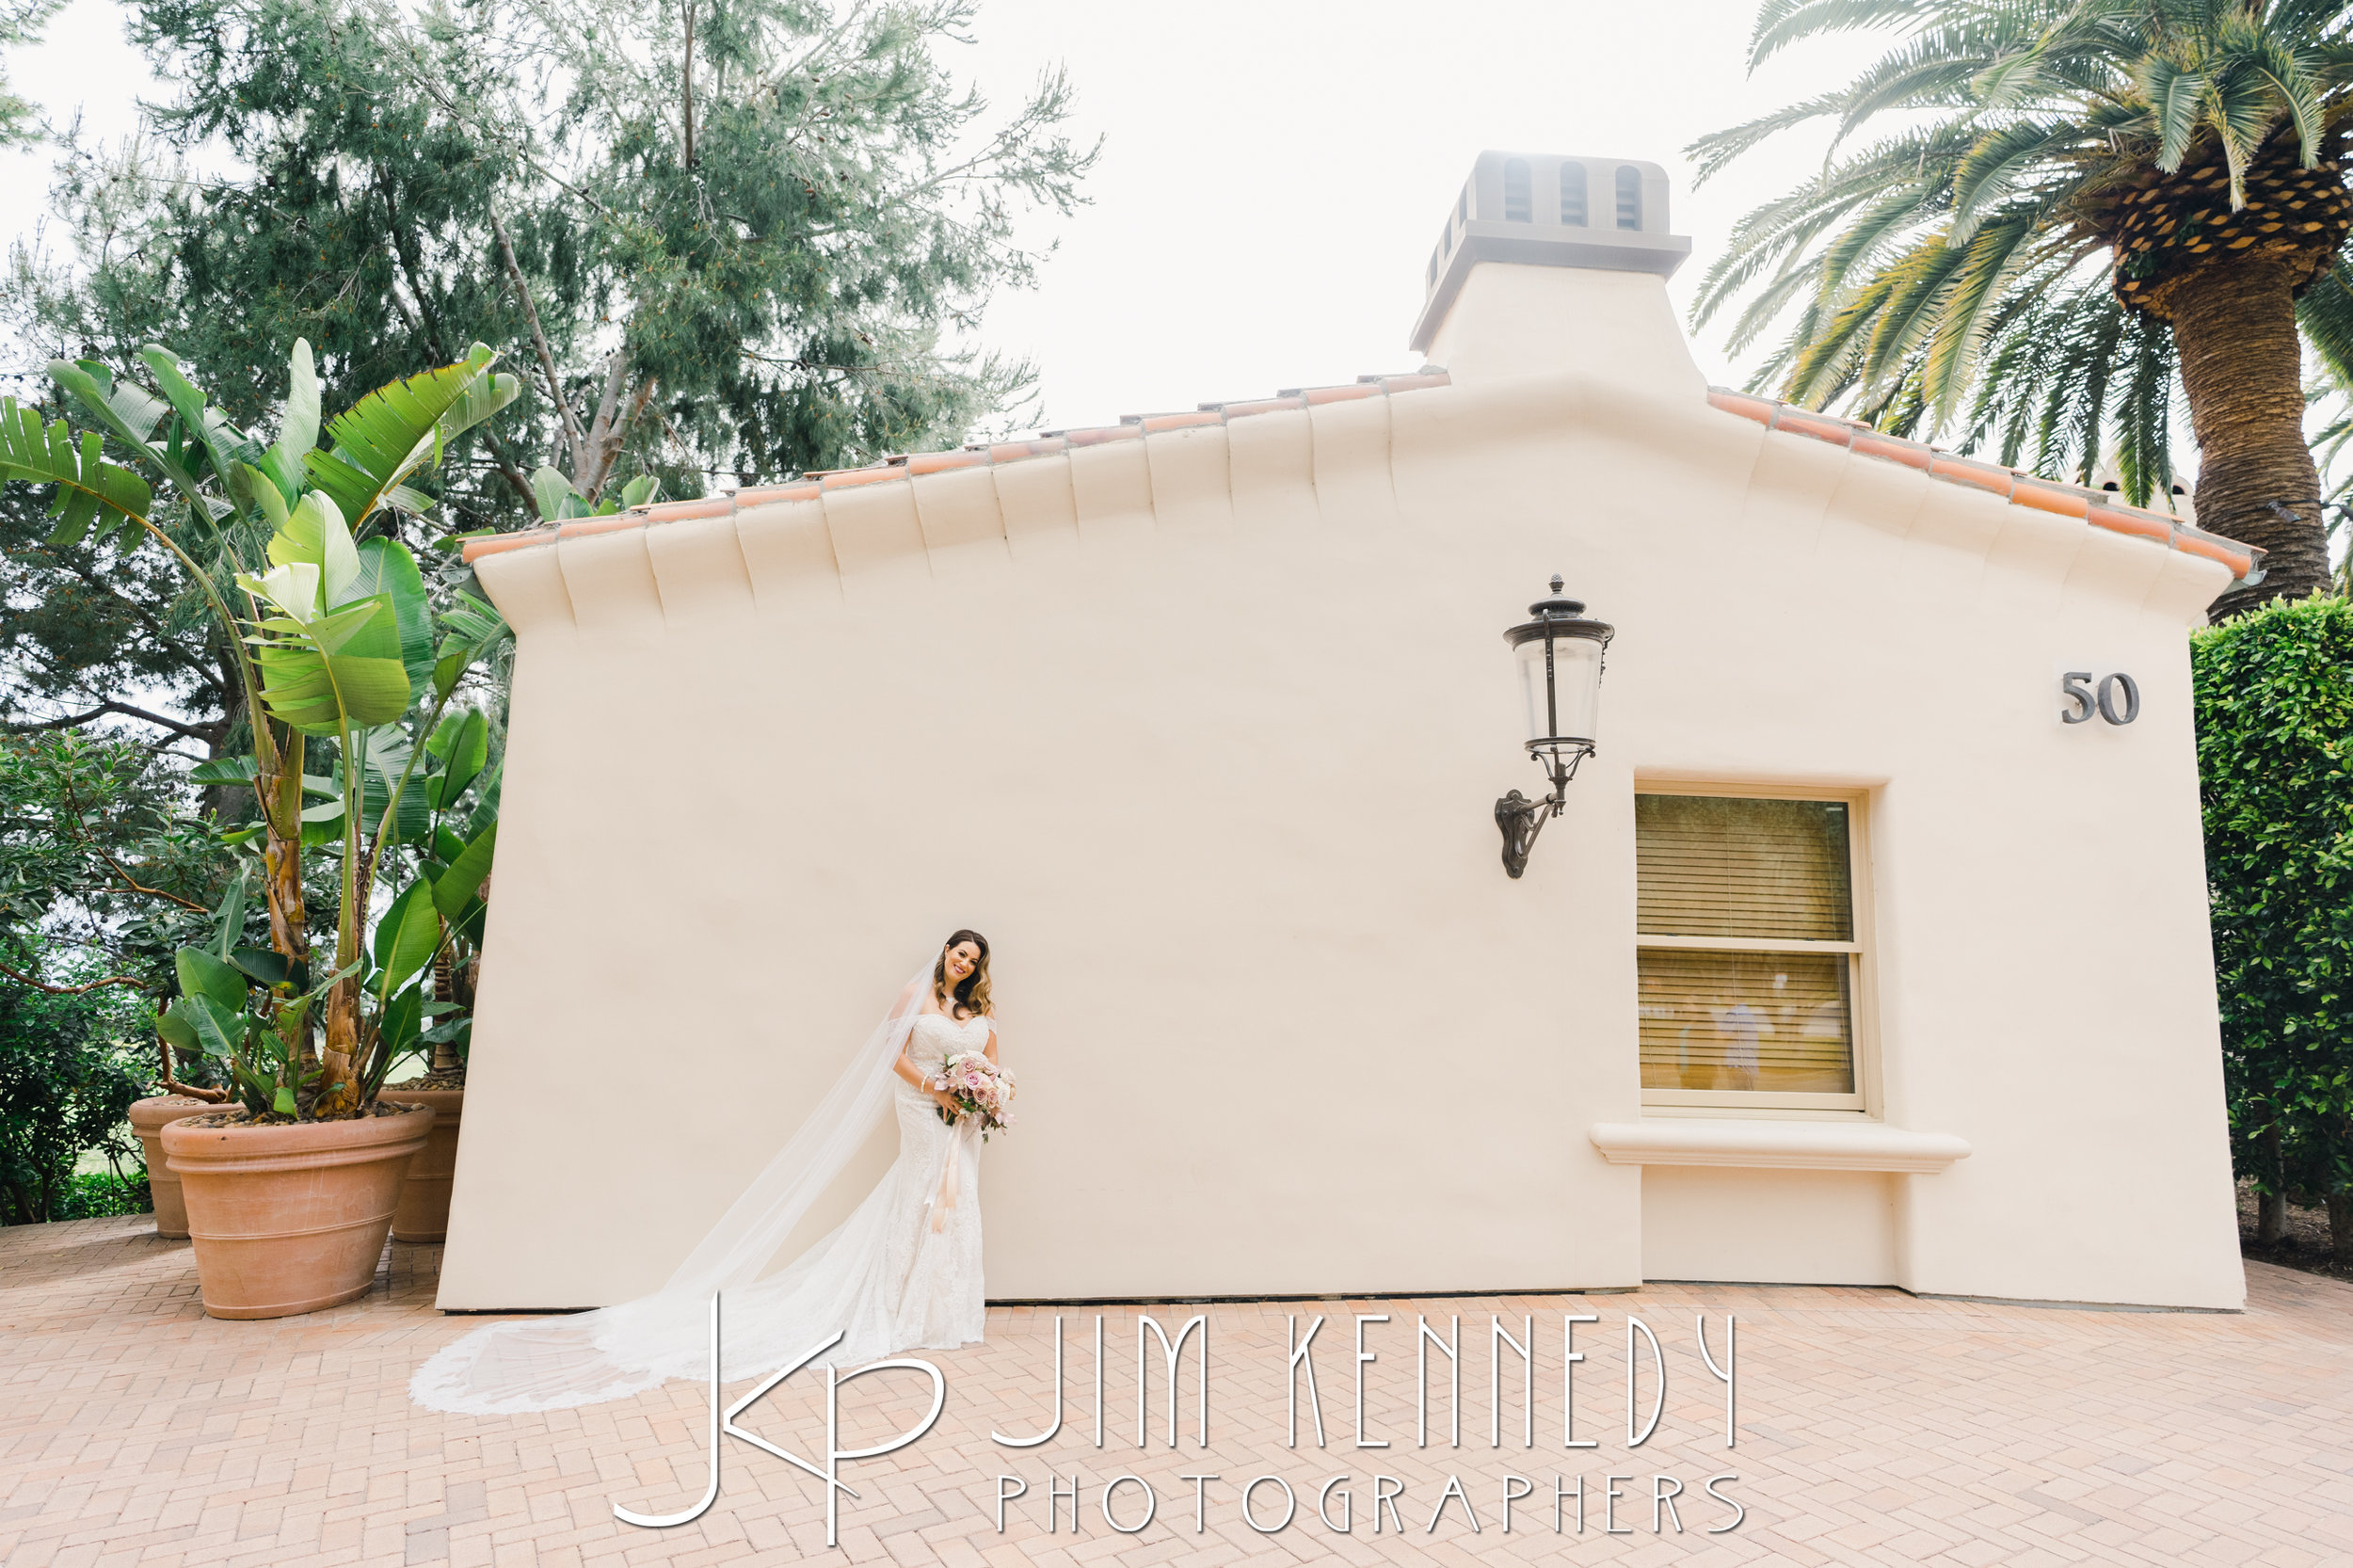 pelican-hill-wedding-jim-kenedy-photographers_0064.JPG